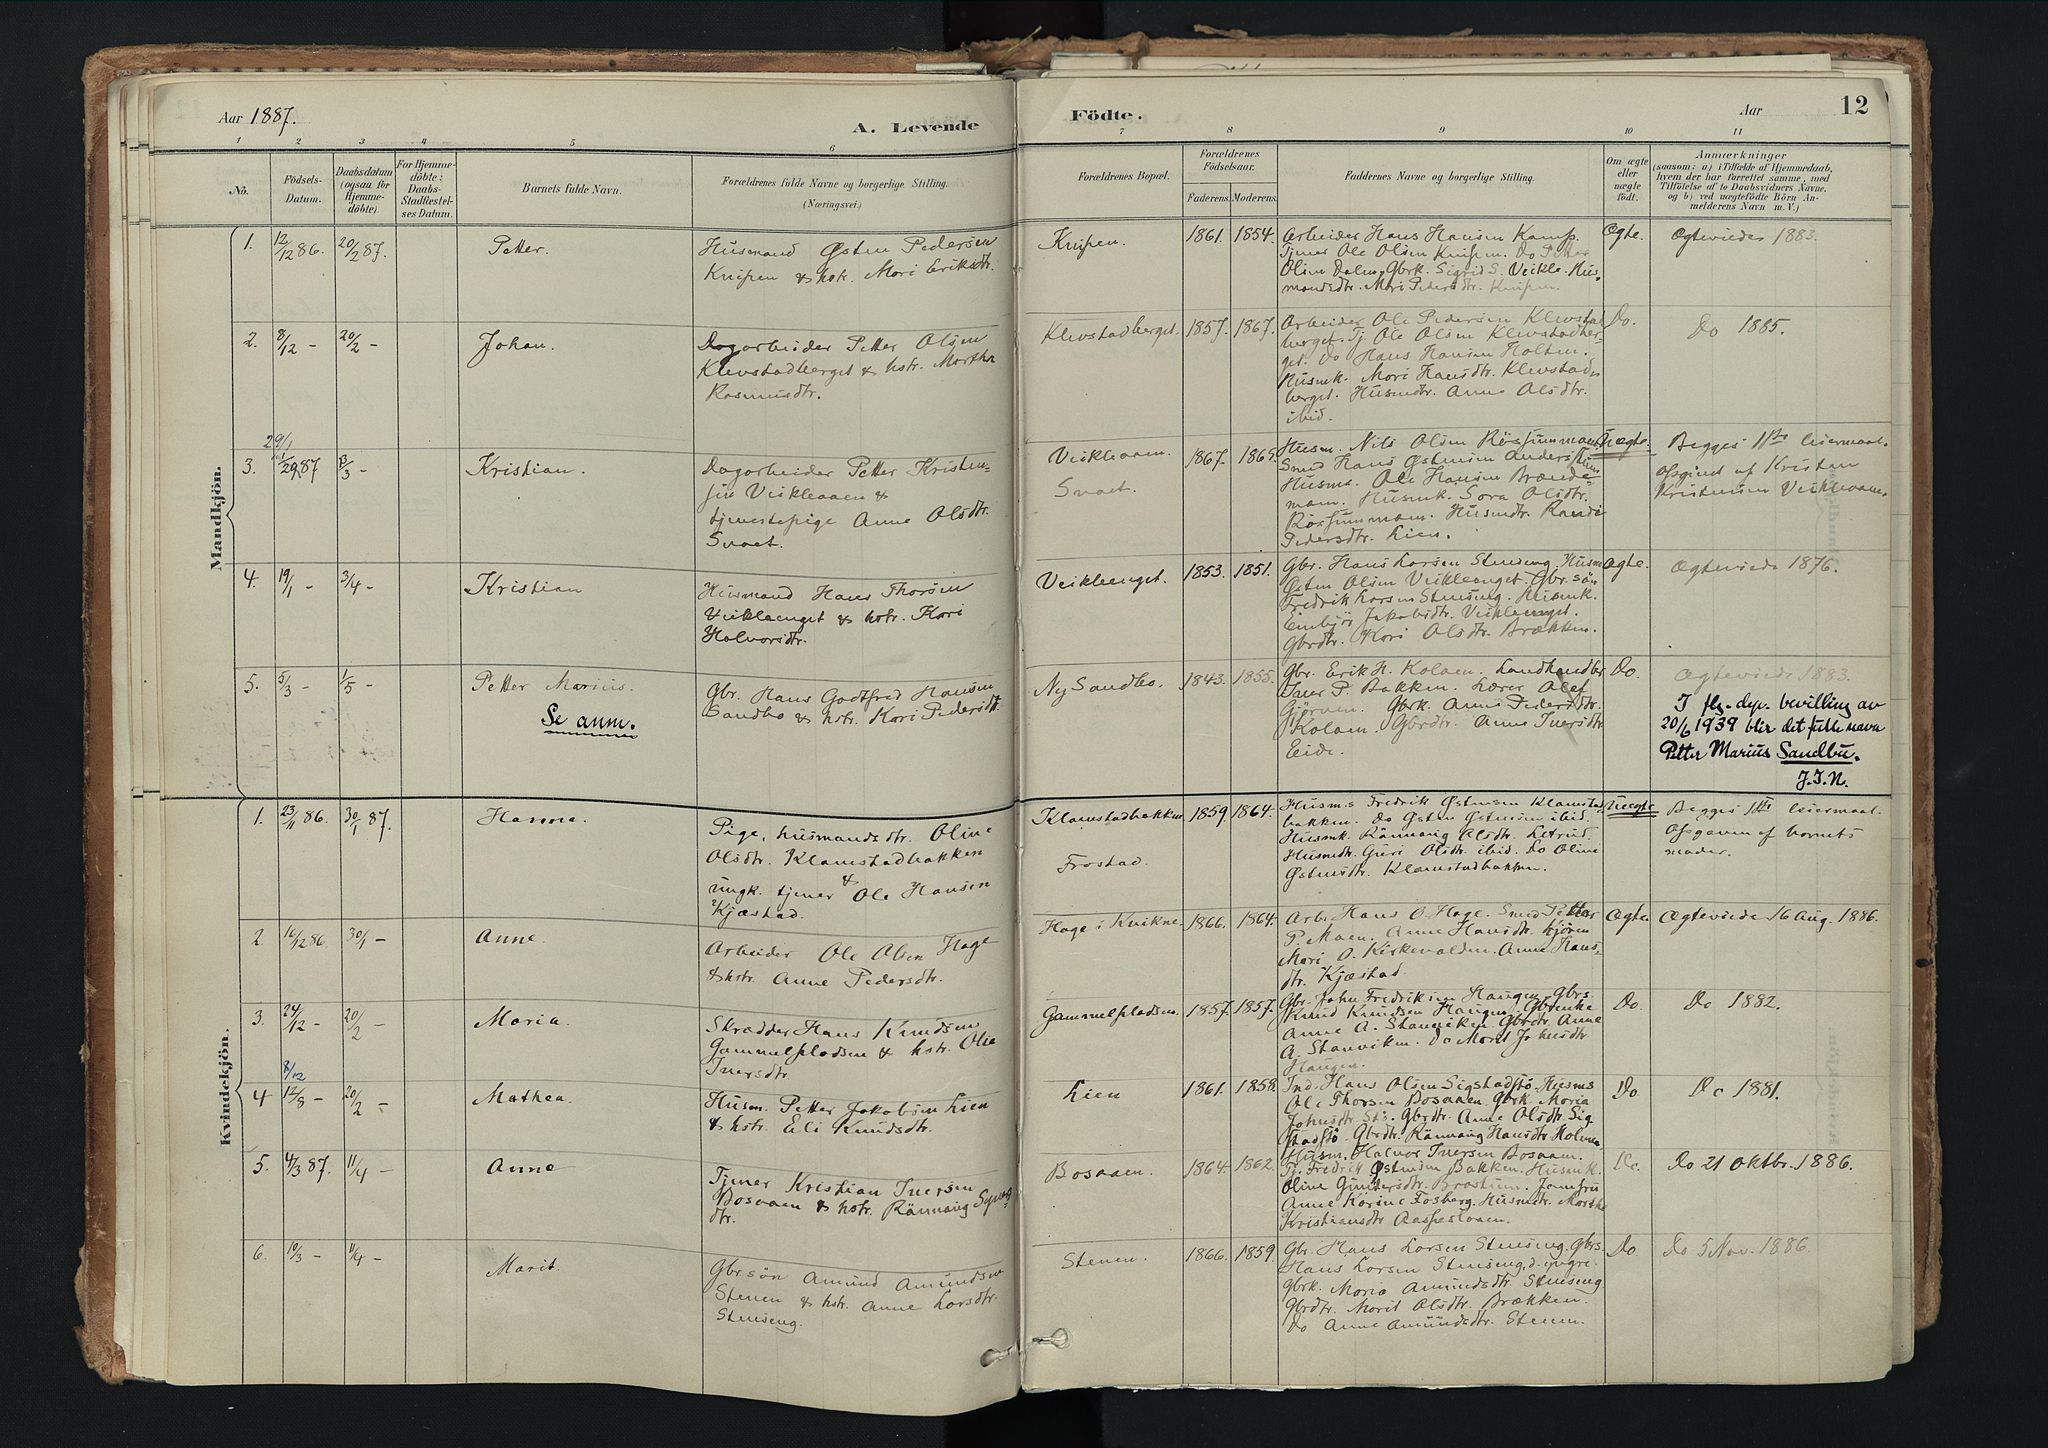 SAH, Nord-Fron prestekontor, Ministerialbok nr. 3, 1884-1914, s. 12